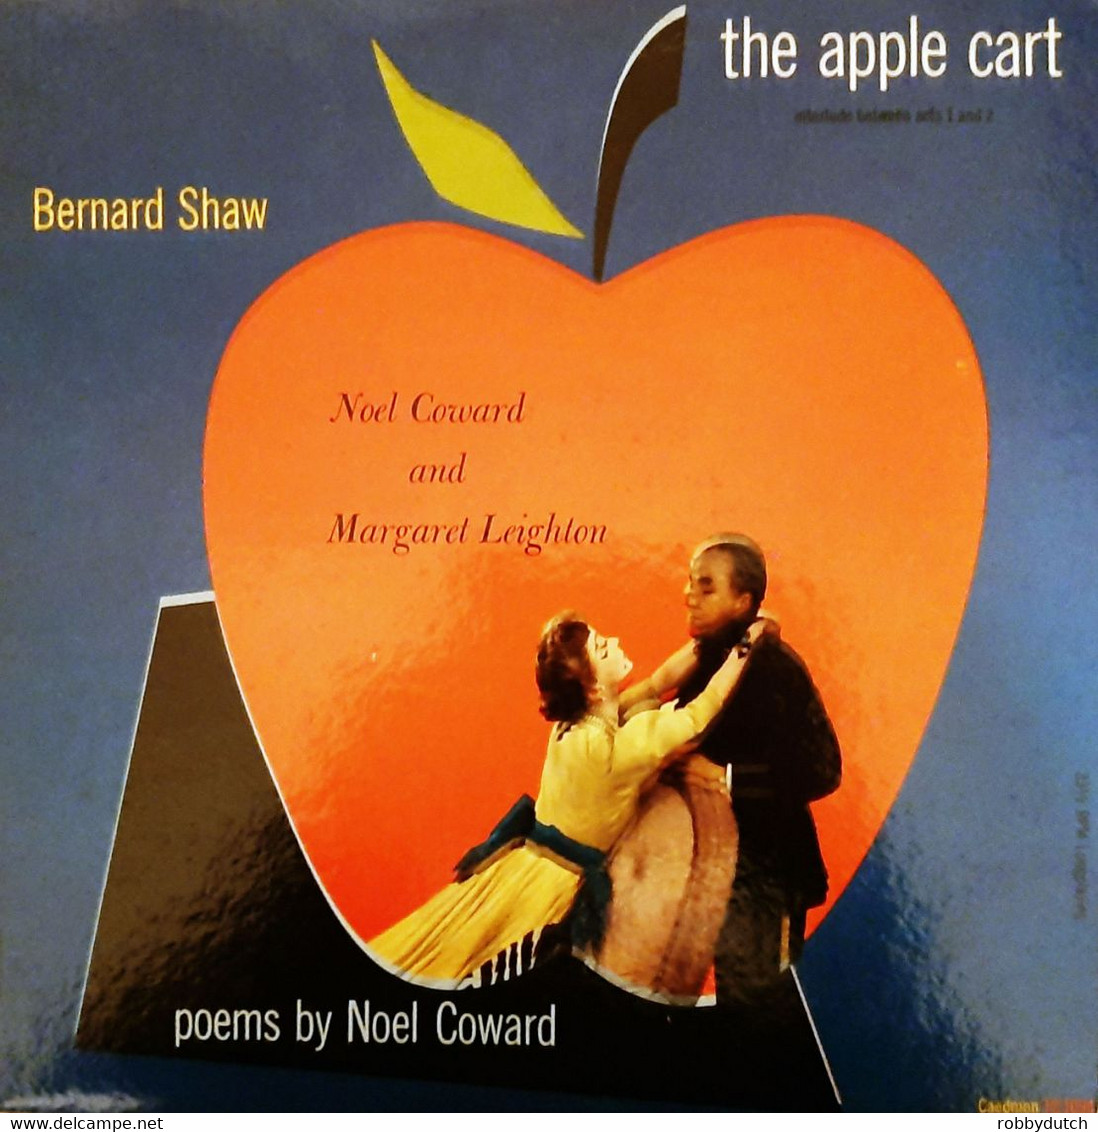 * LP * BERNARD SHAW: THE APPLE CART / POEMS BY NOËL COWARD (USA Ex!!!) - Collector's Editions